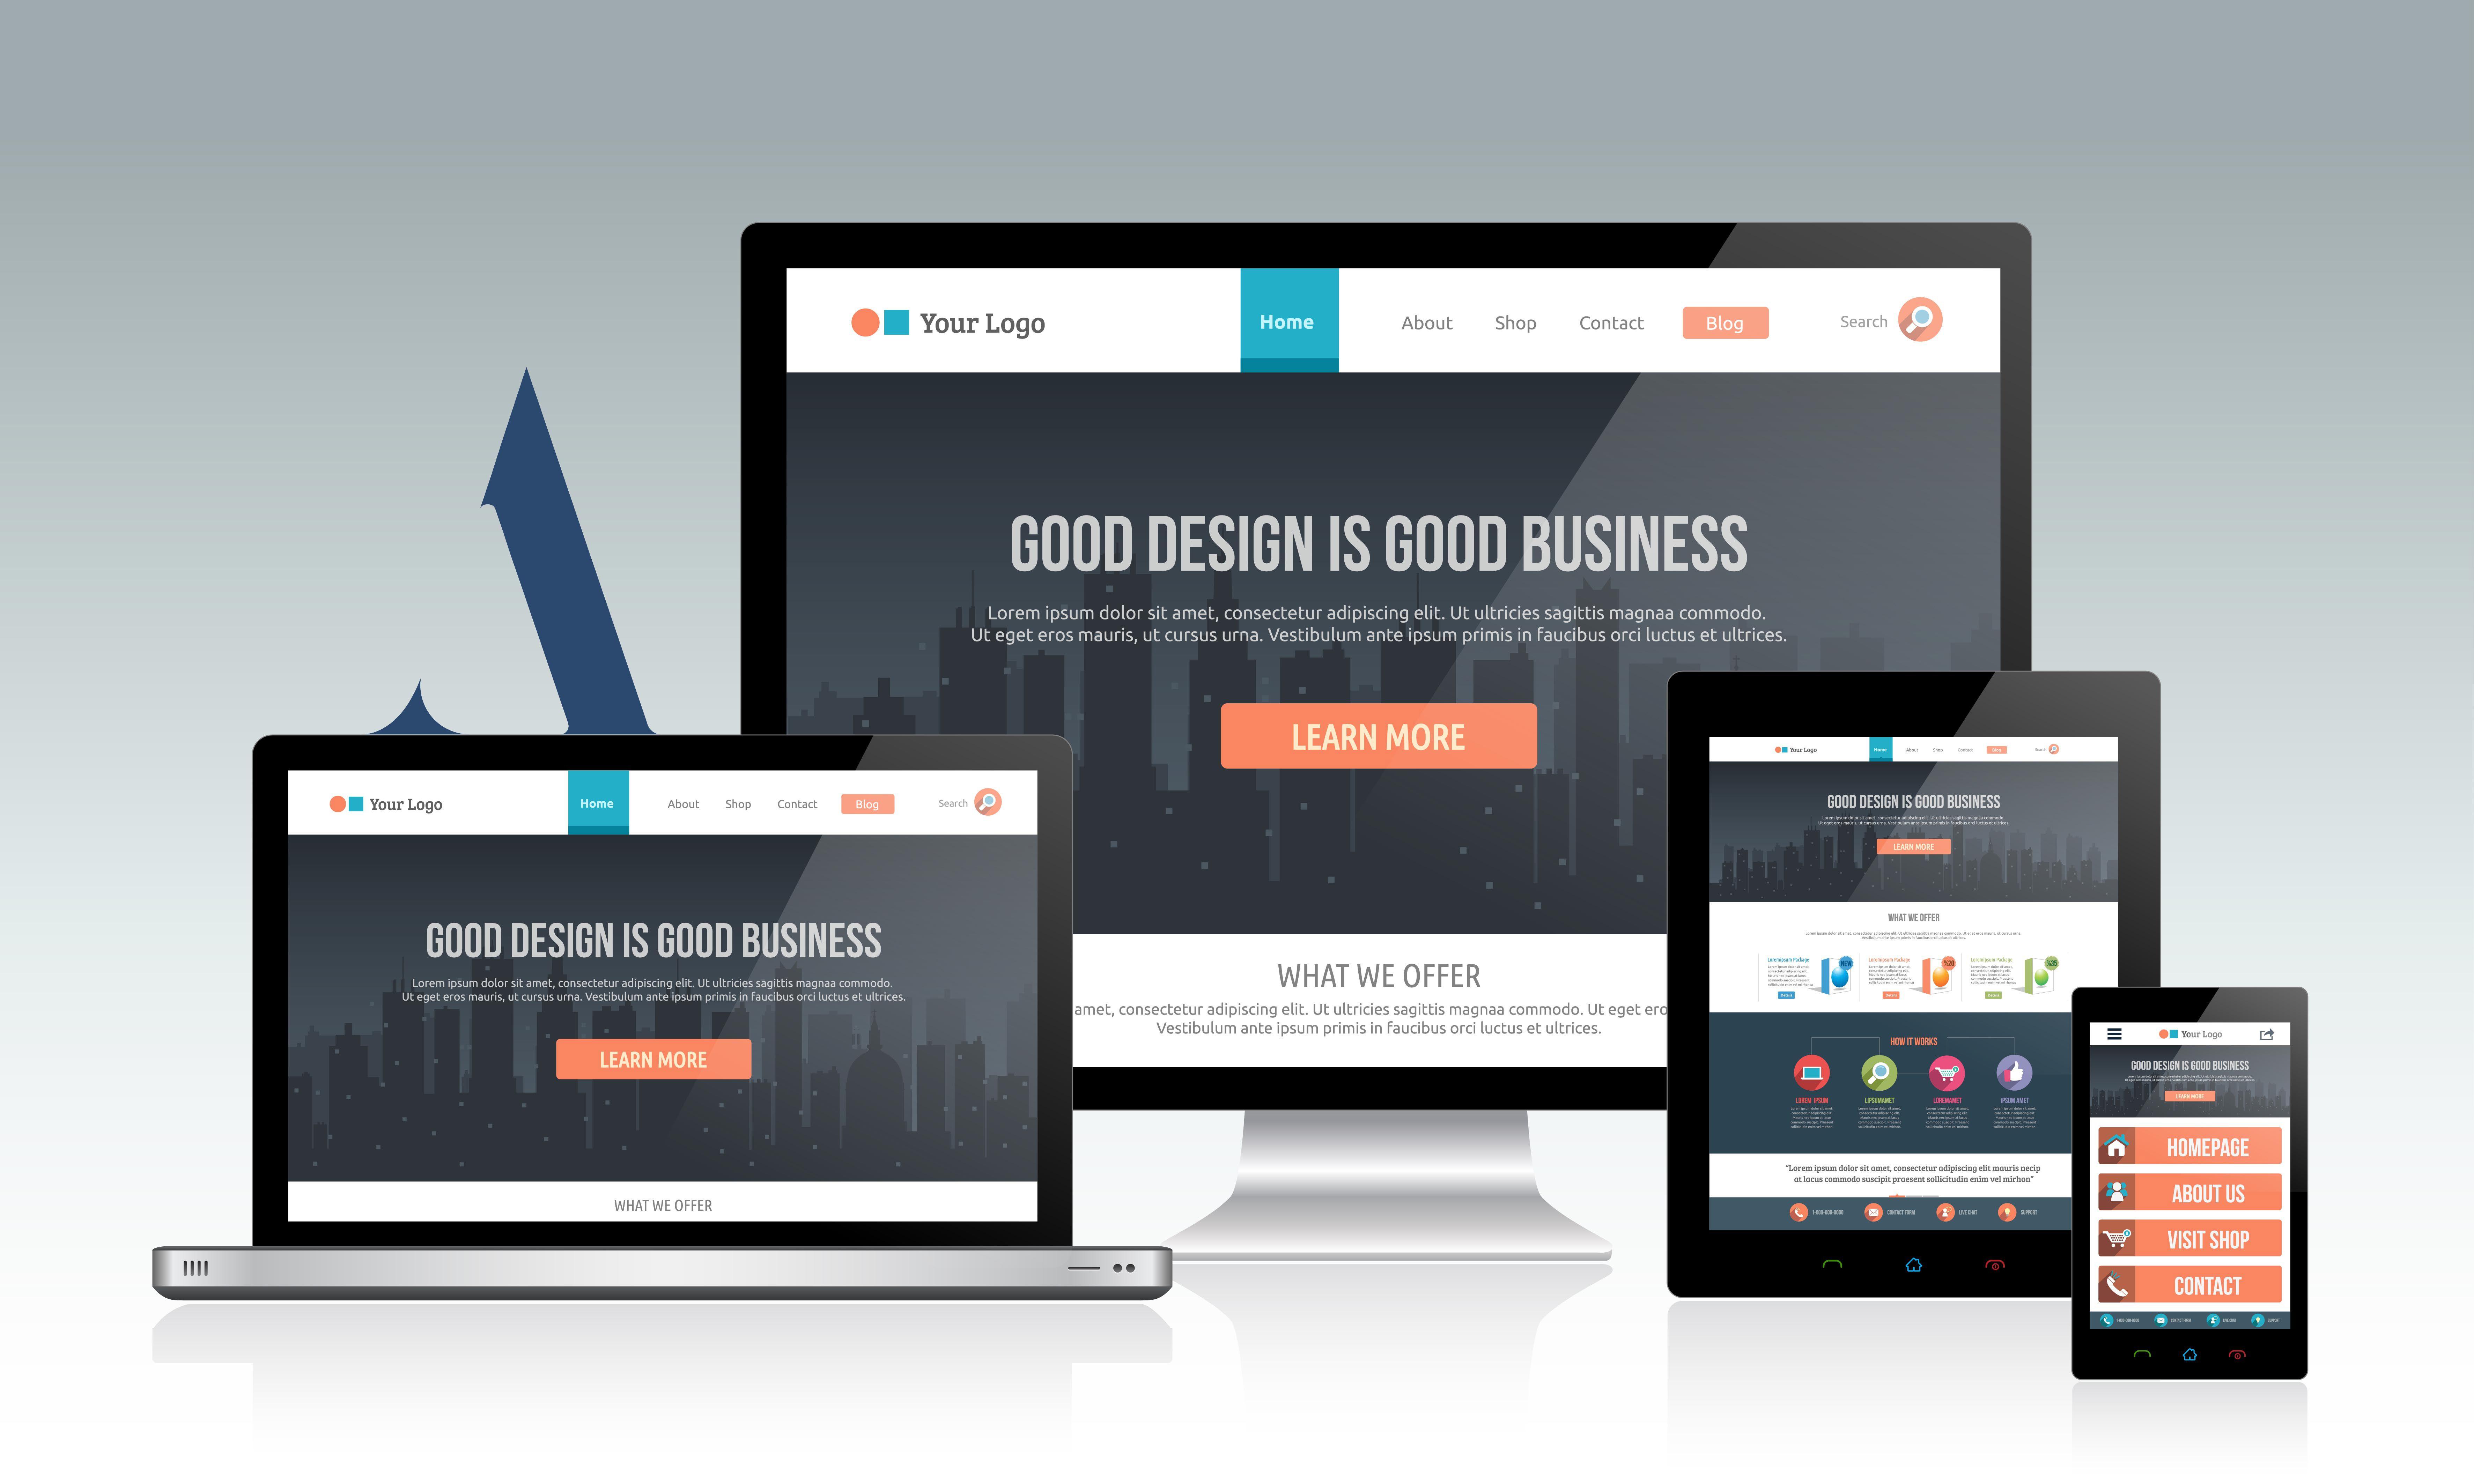 ¿Necesitas una página web? Arroba es la empresa que buscas, líderes en mercadeo digital. #ArrobaPR #LetsGetSocial  www.arrobapr.com 787-834-7200